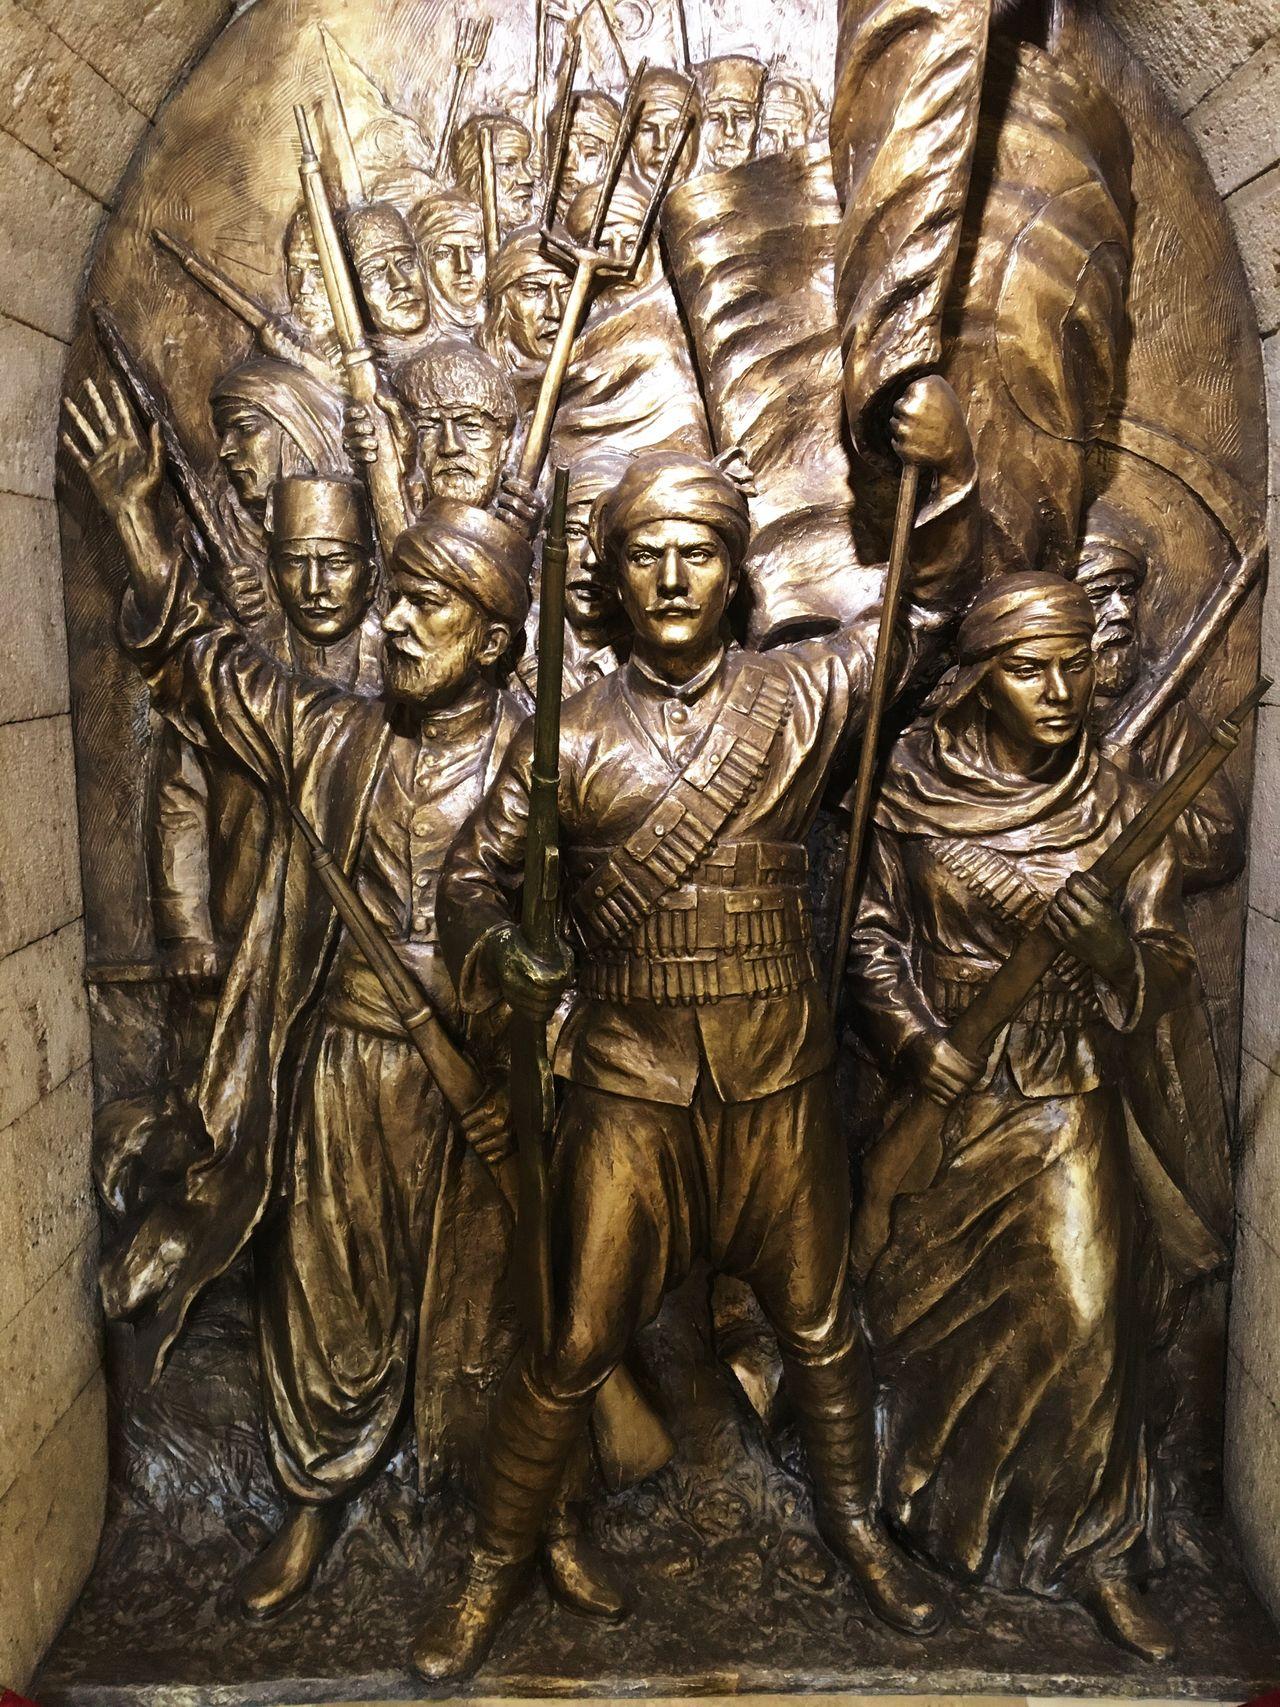 Anitkabir Mausoleum Atatürk Sculpture Relief Metal Metallic Metalwork Metal Art Metal Sculpture History Historic Independence Day Independence Turk Turkish Anatolia